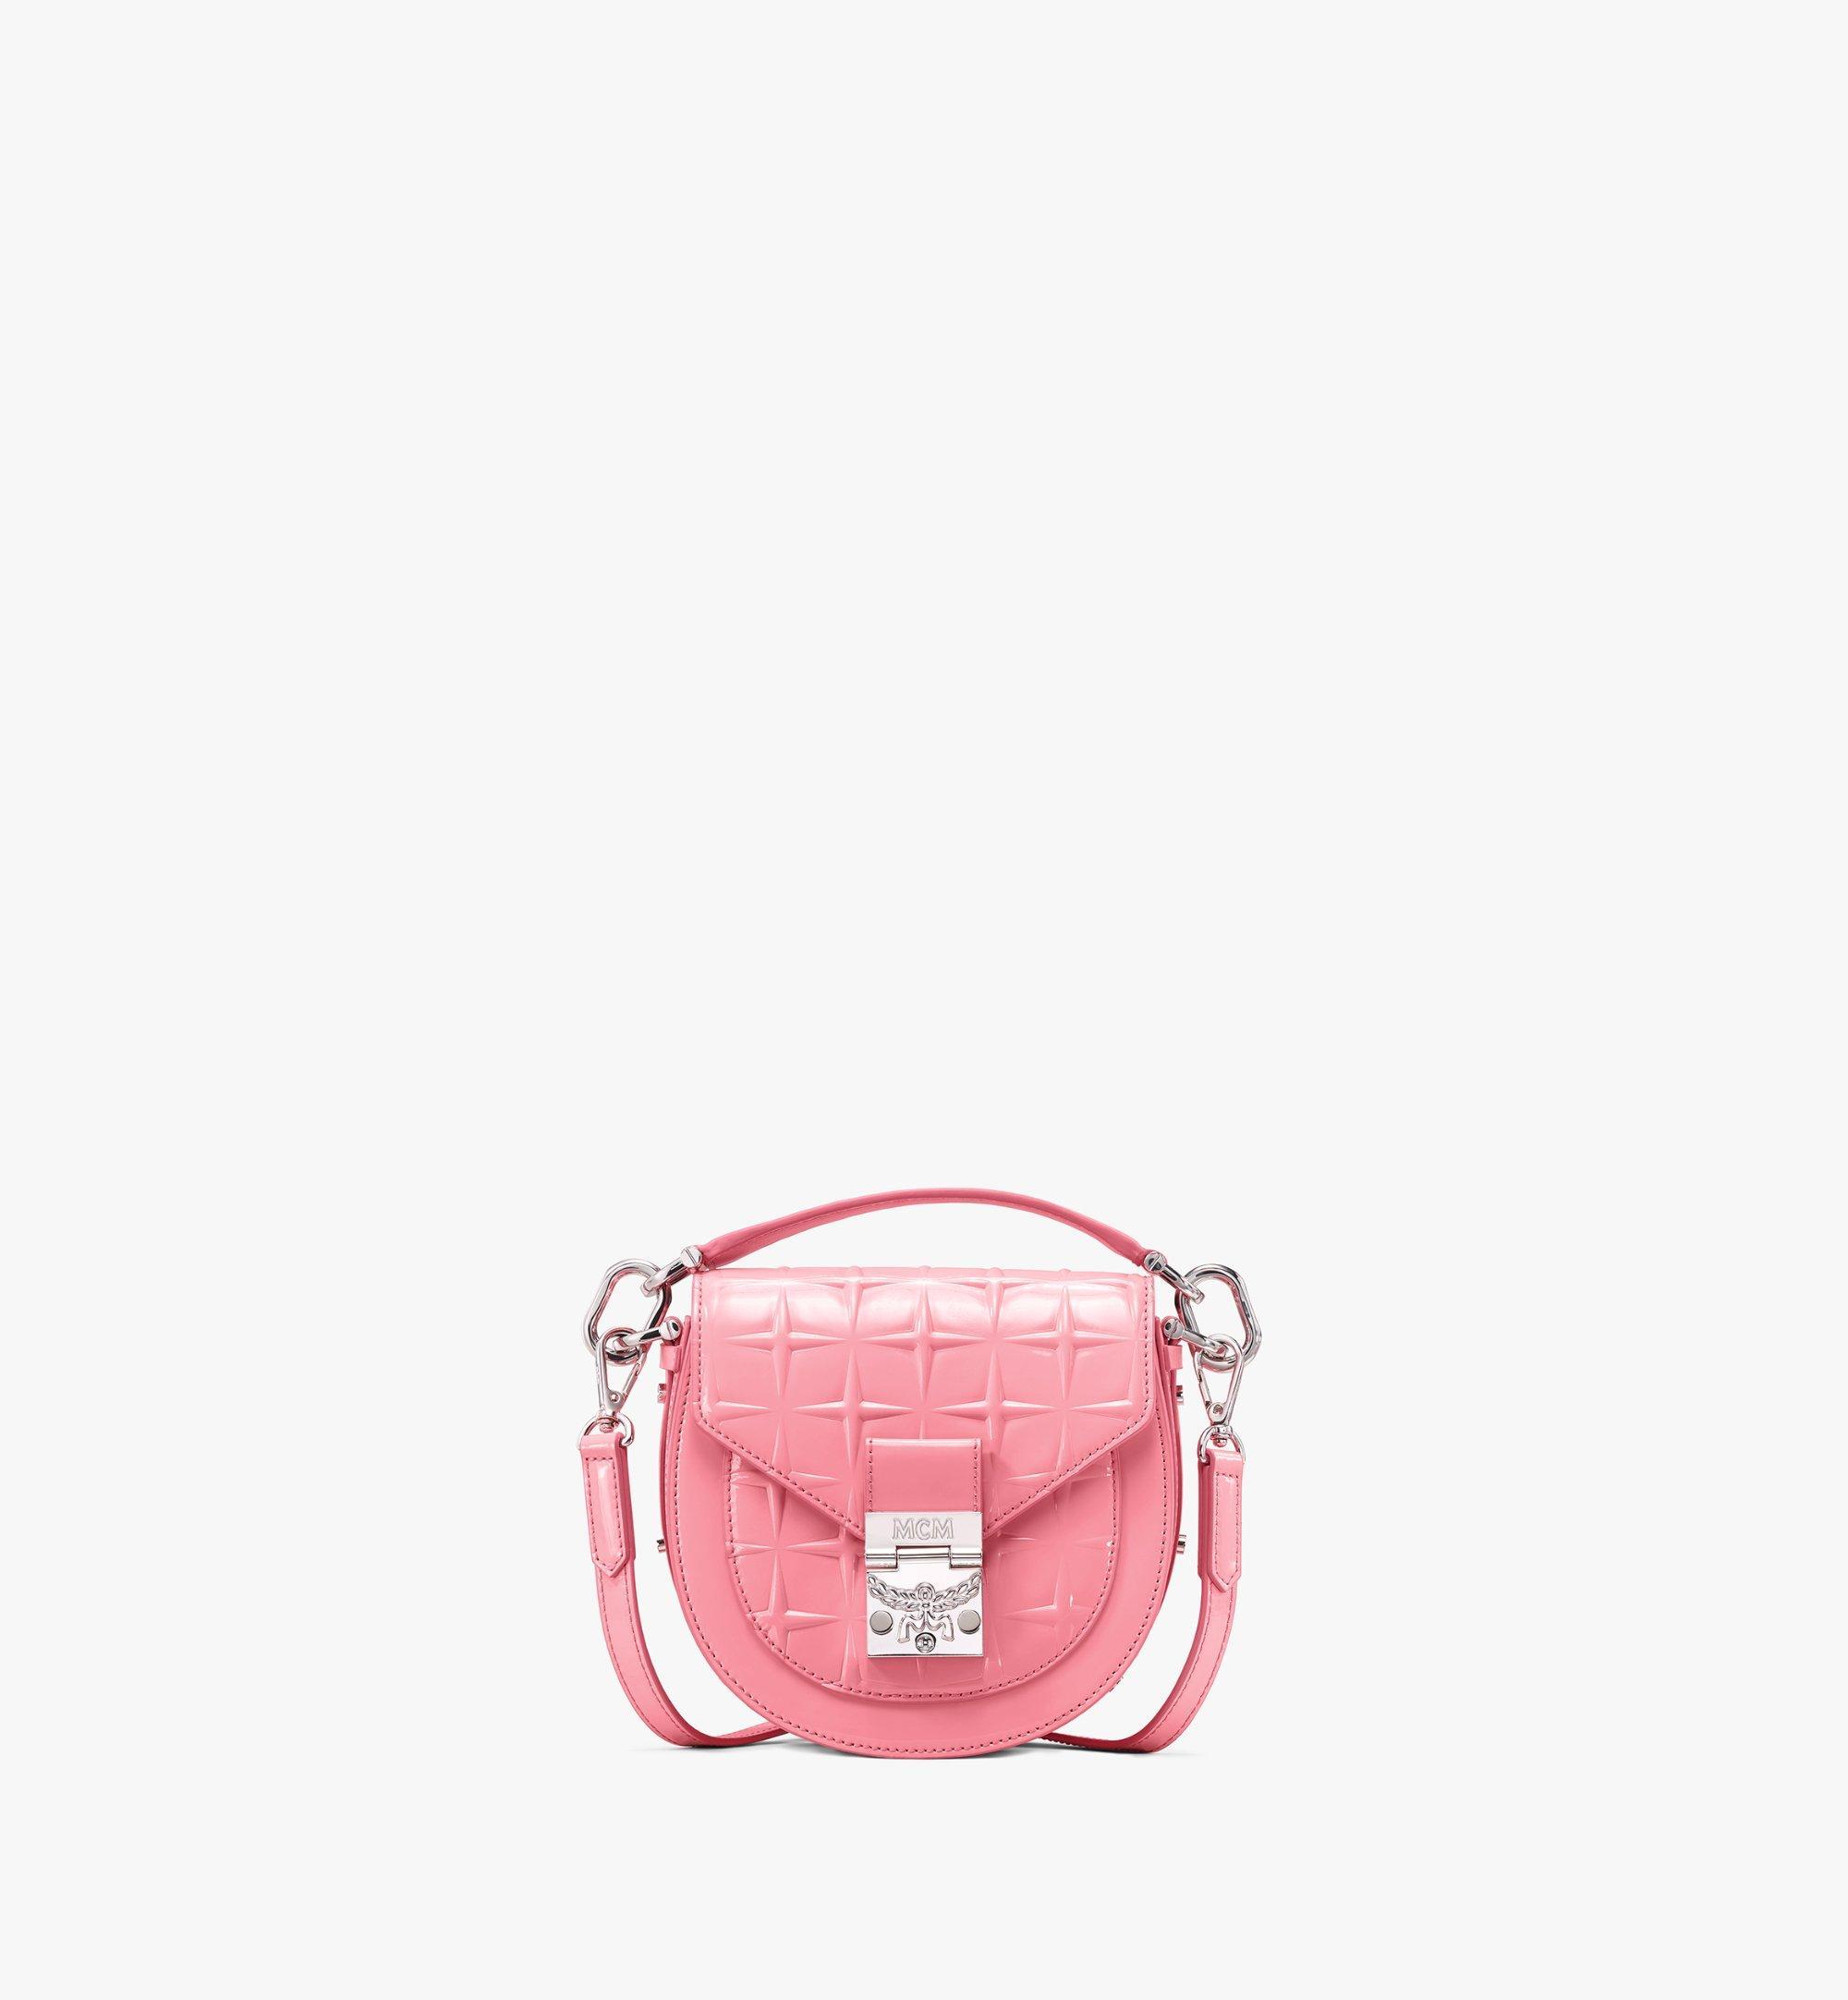 MCM Patricia Shoulder Bag in Diamond Patent Leather Pink MWSASPA14QG001 Alternate View 1